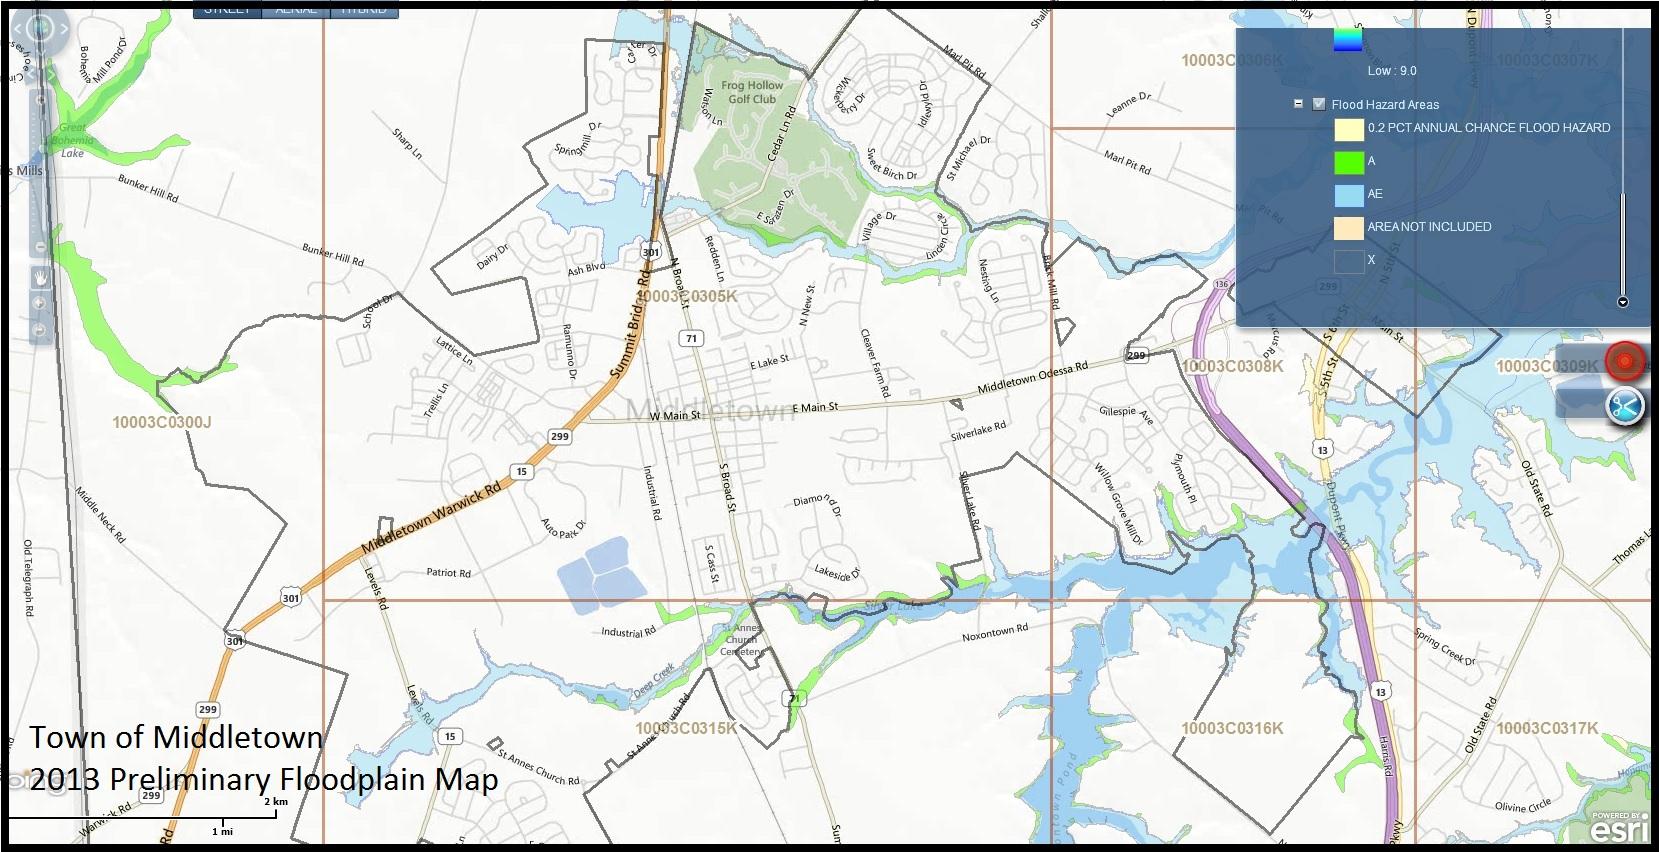 middletown floodplain ( map). floodplain information